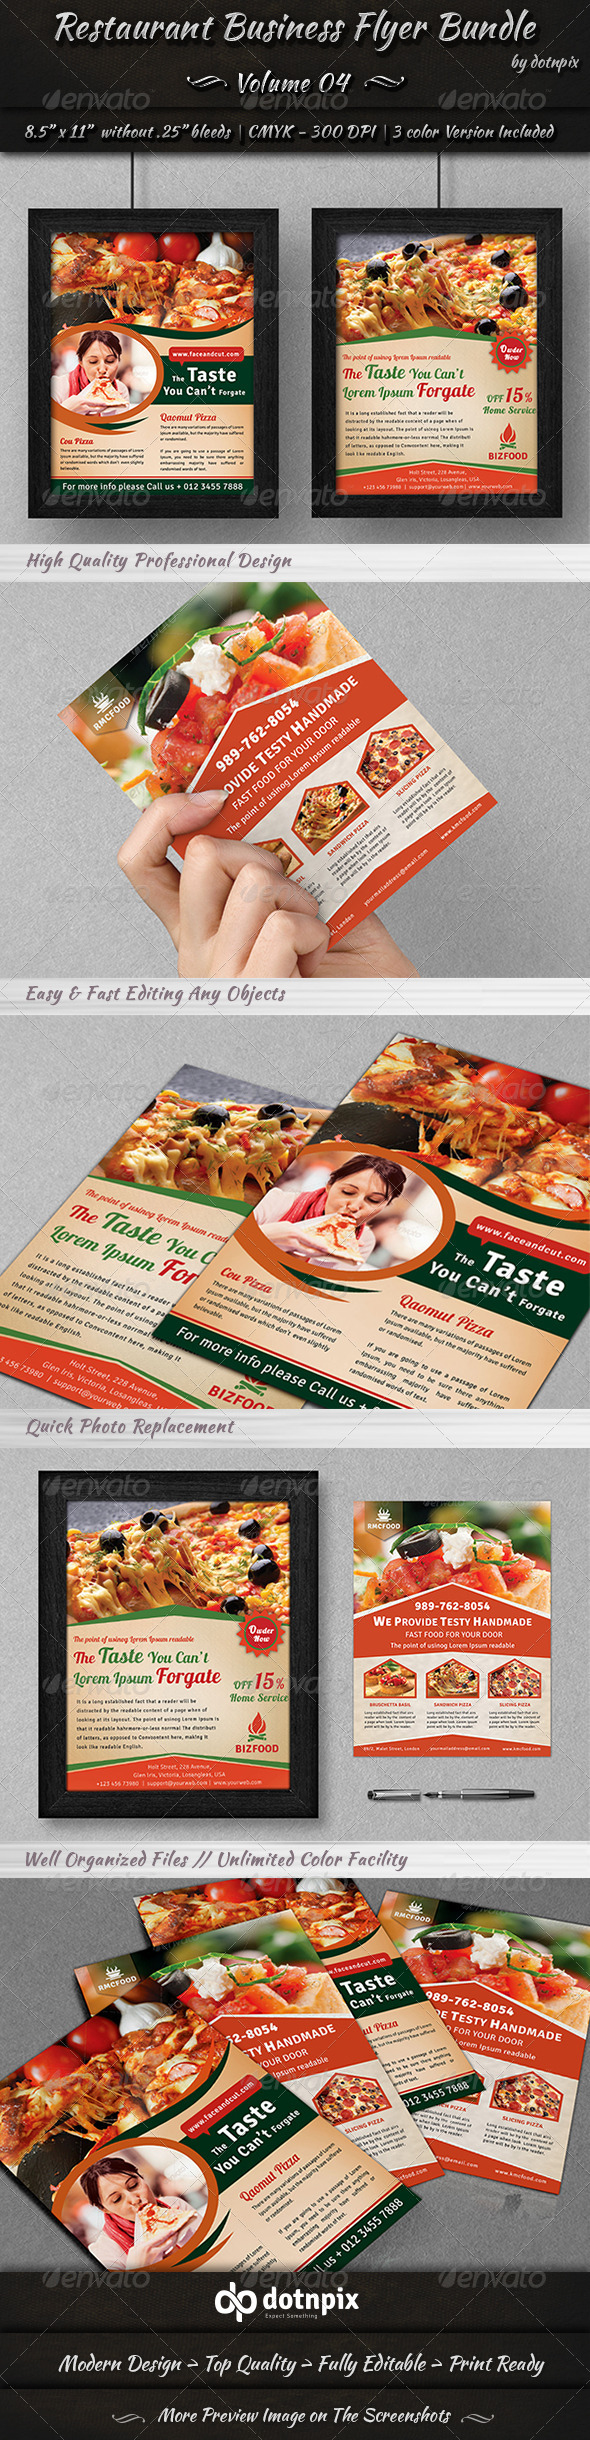 GraphicRiver Restaurant Business Flyer Bundle Volume 4 6990226